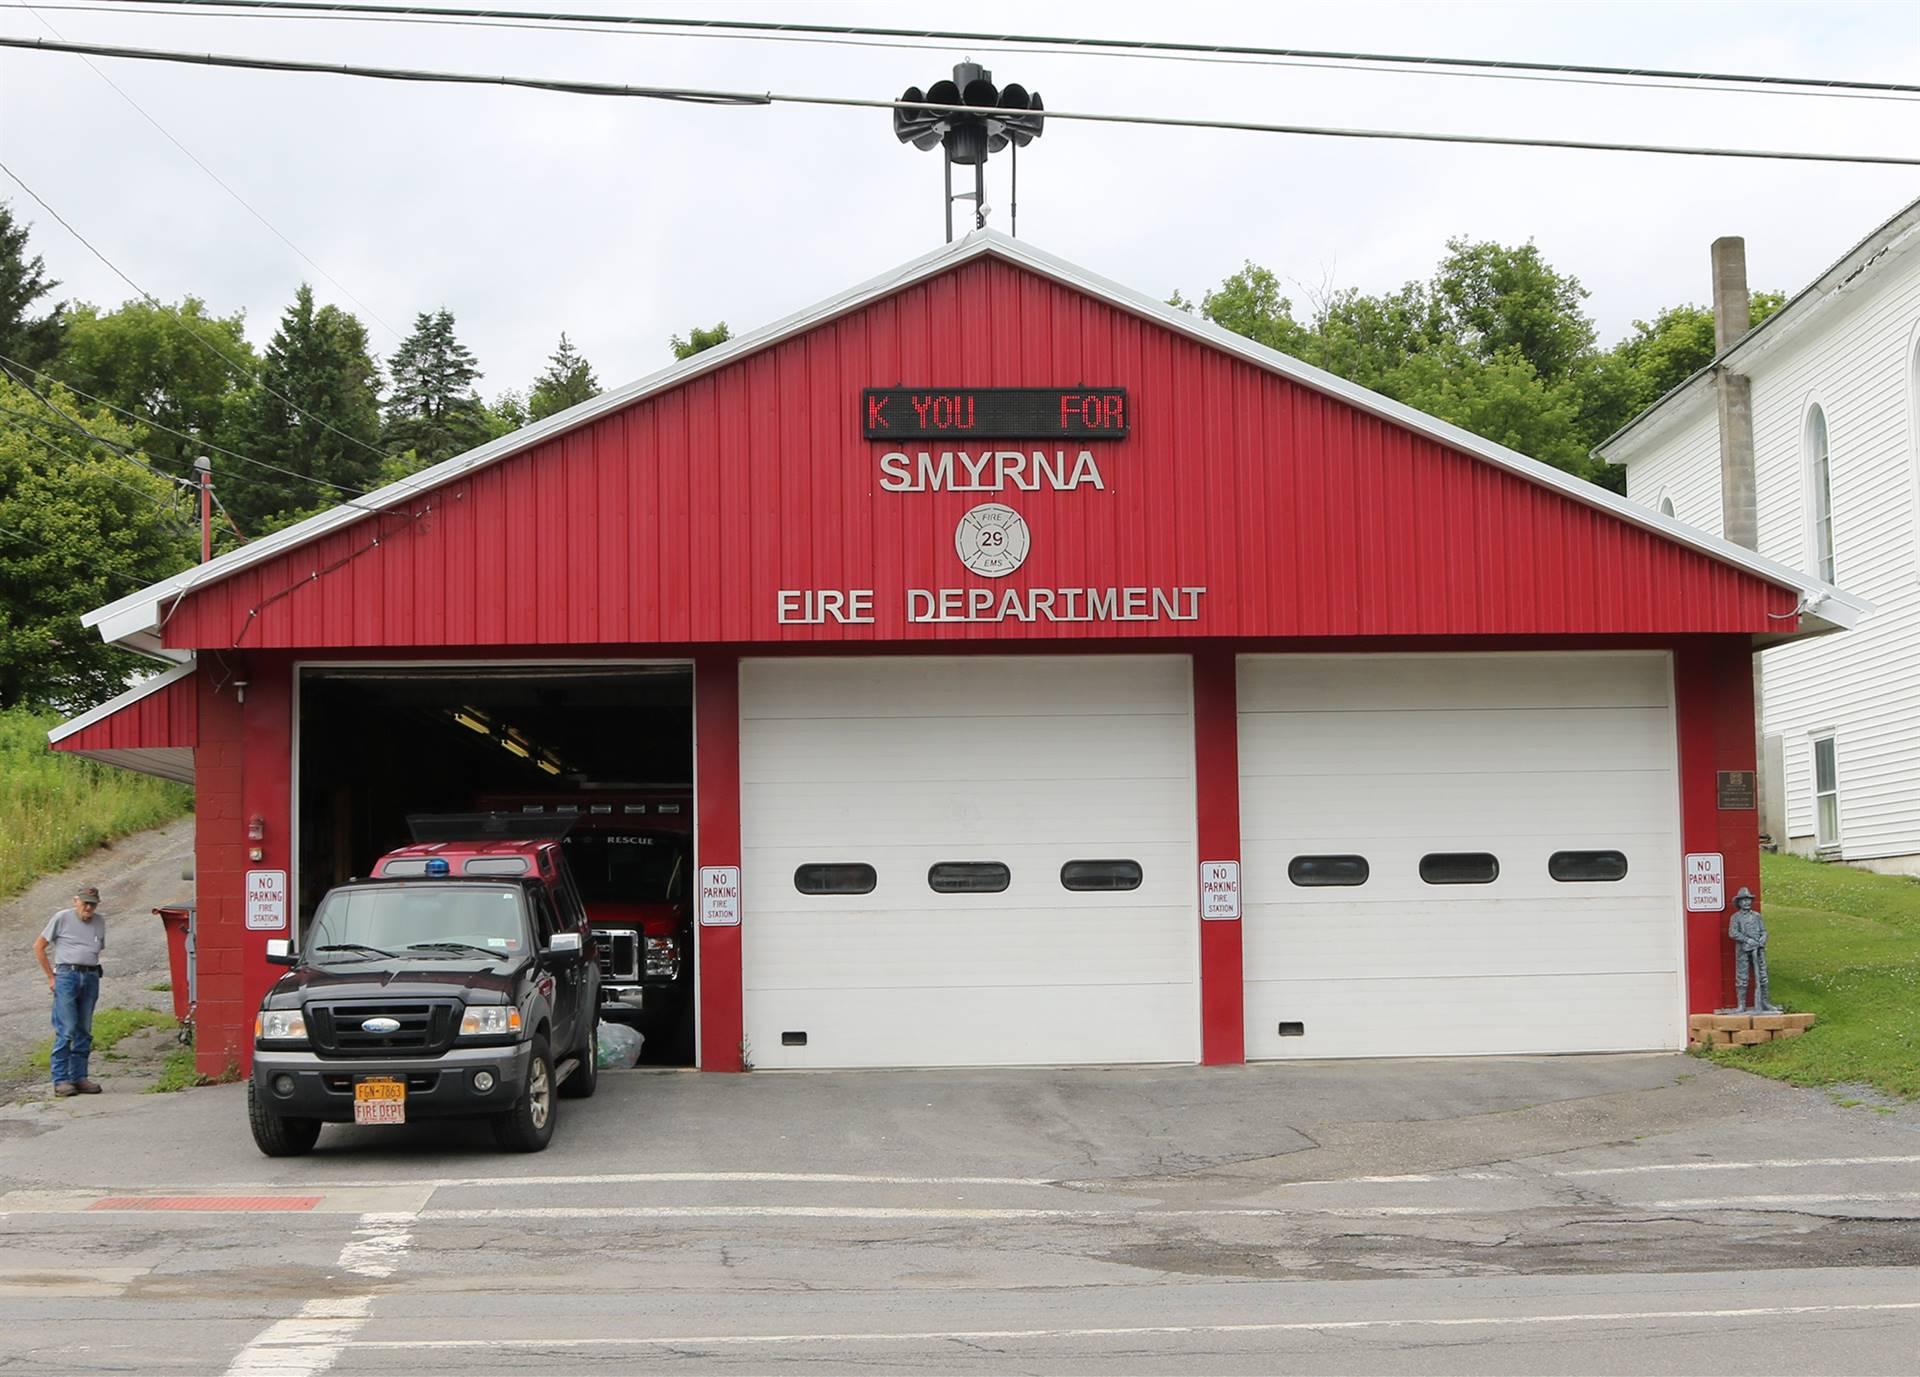 Smyrna Fire Department